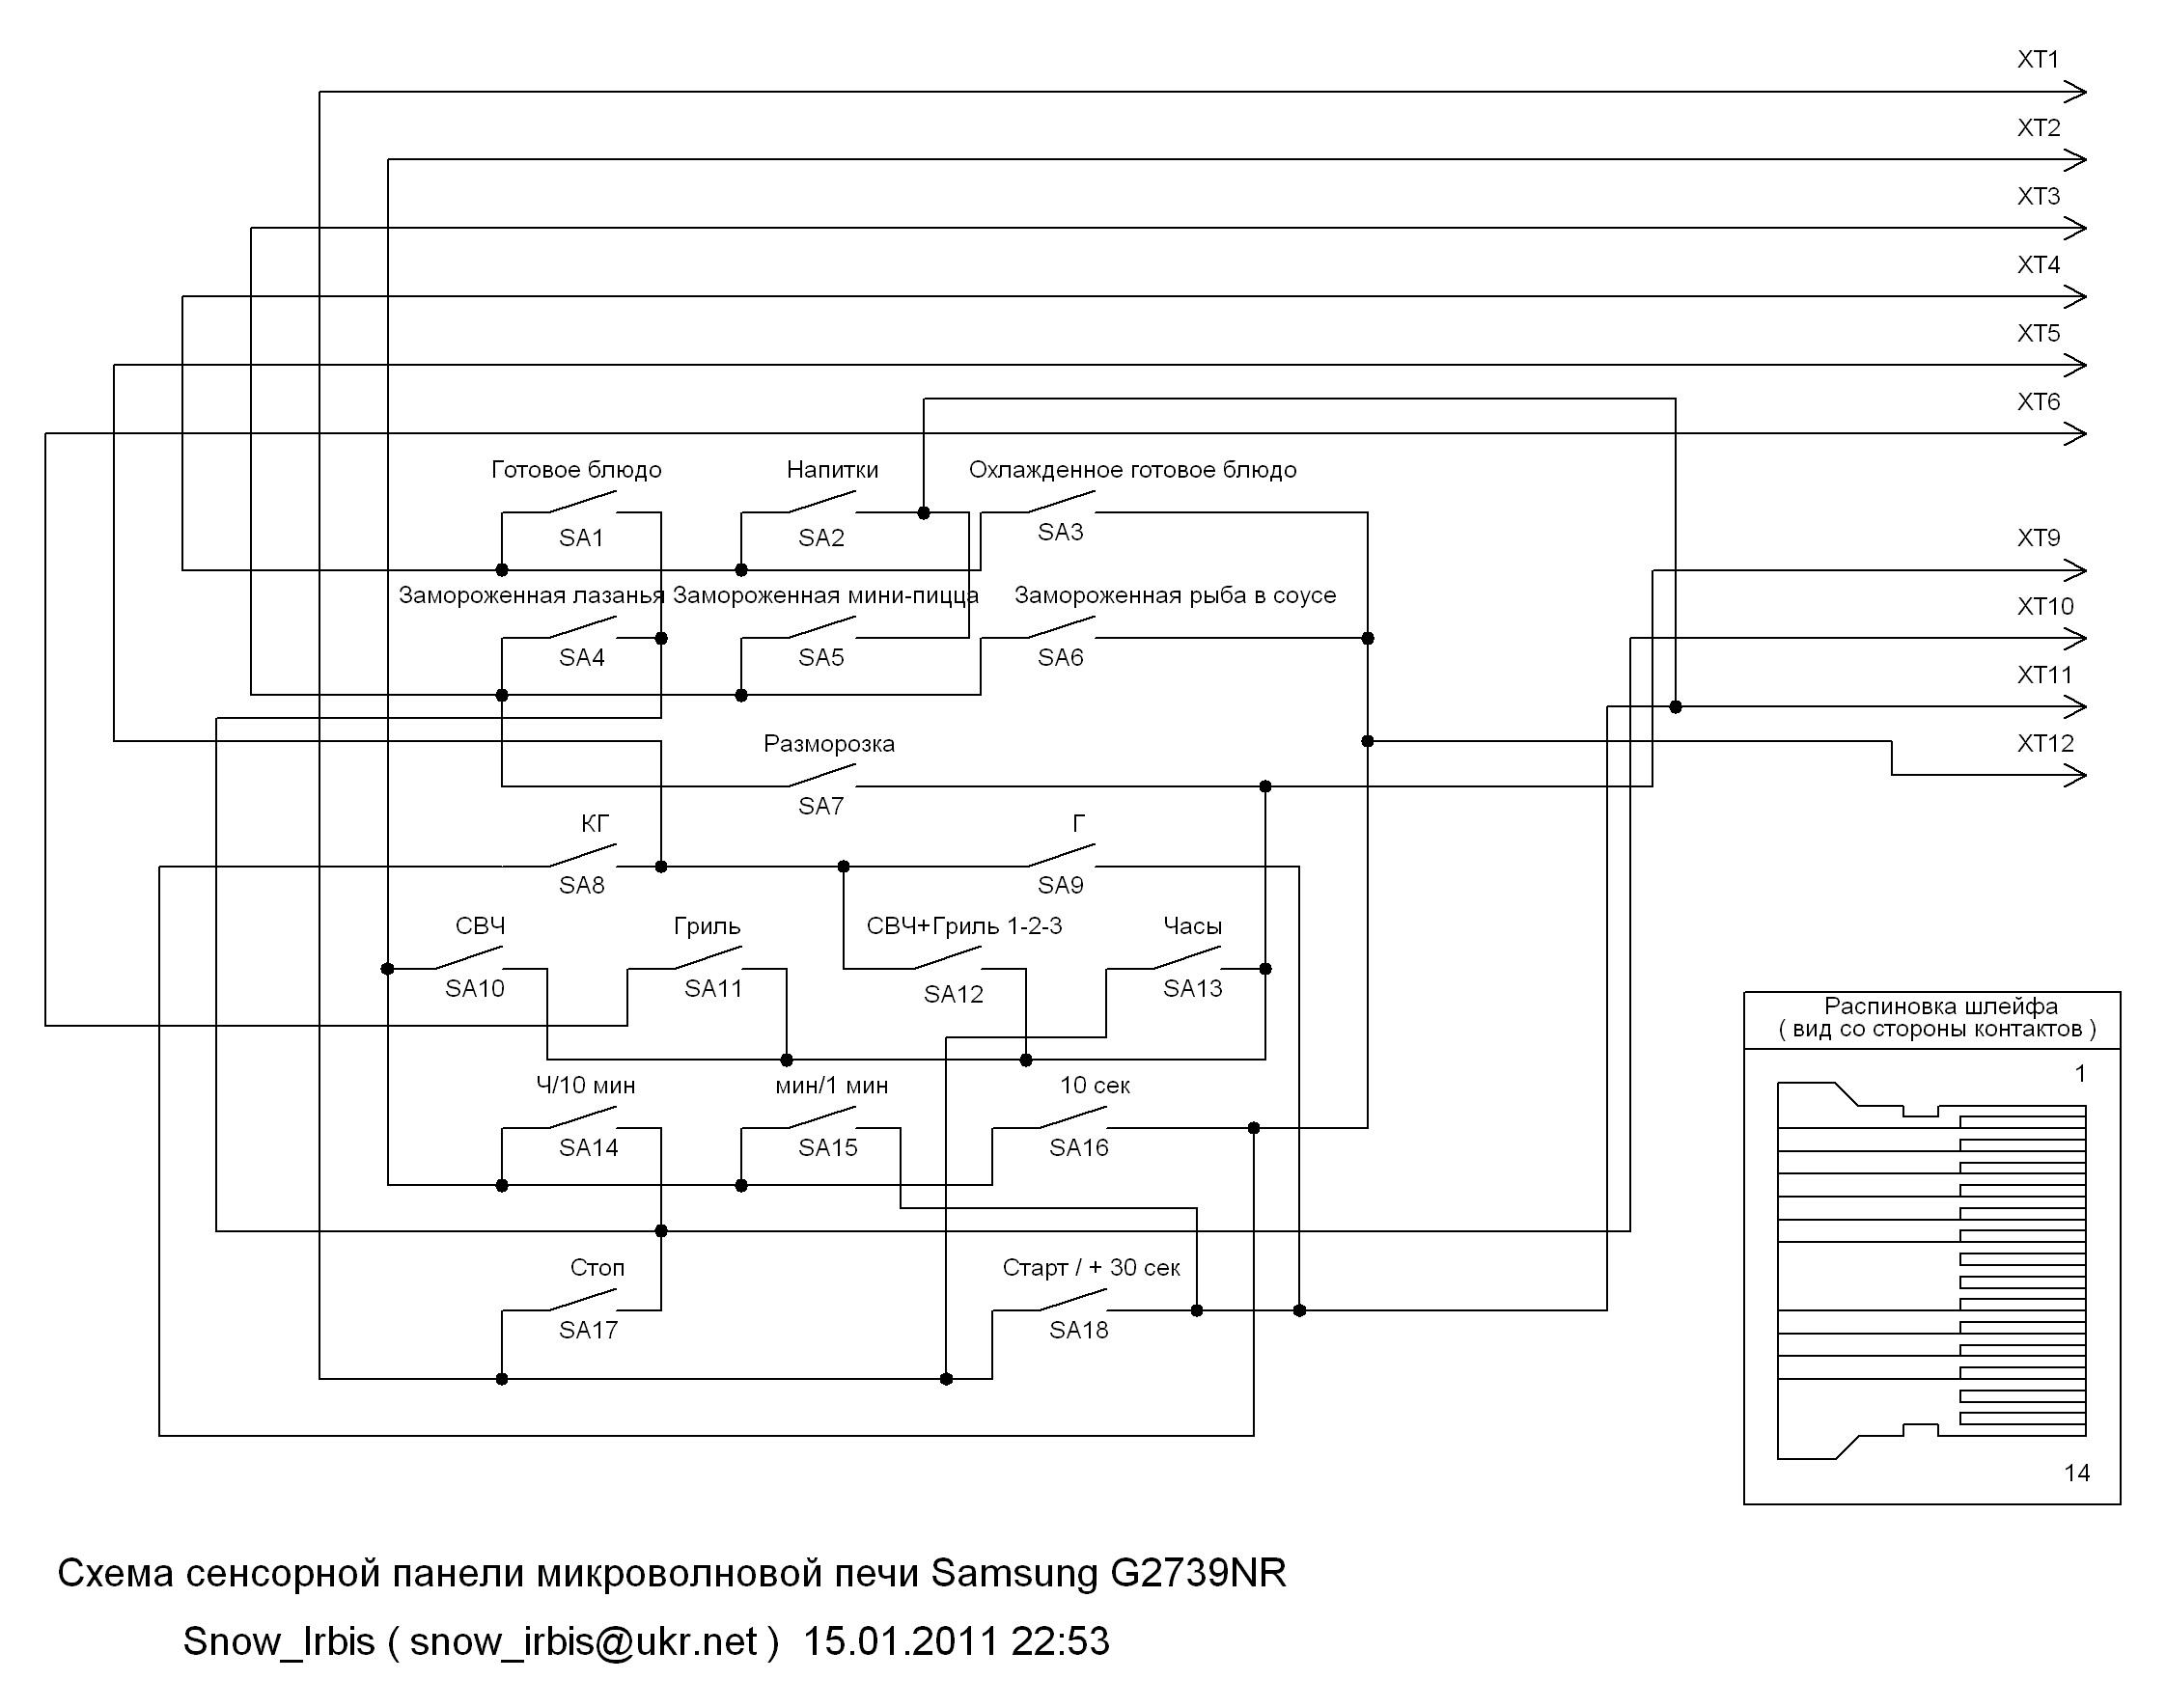 Samsung g2739nr схема